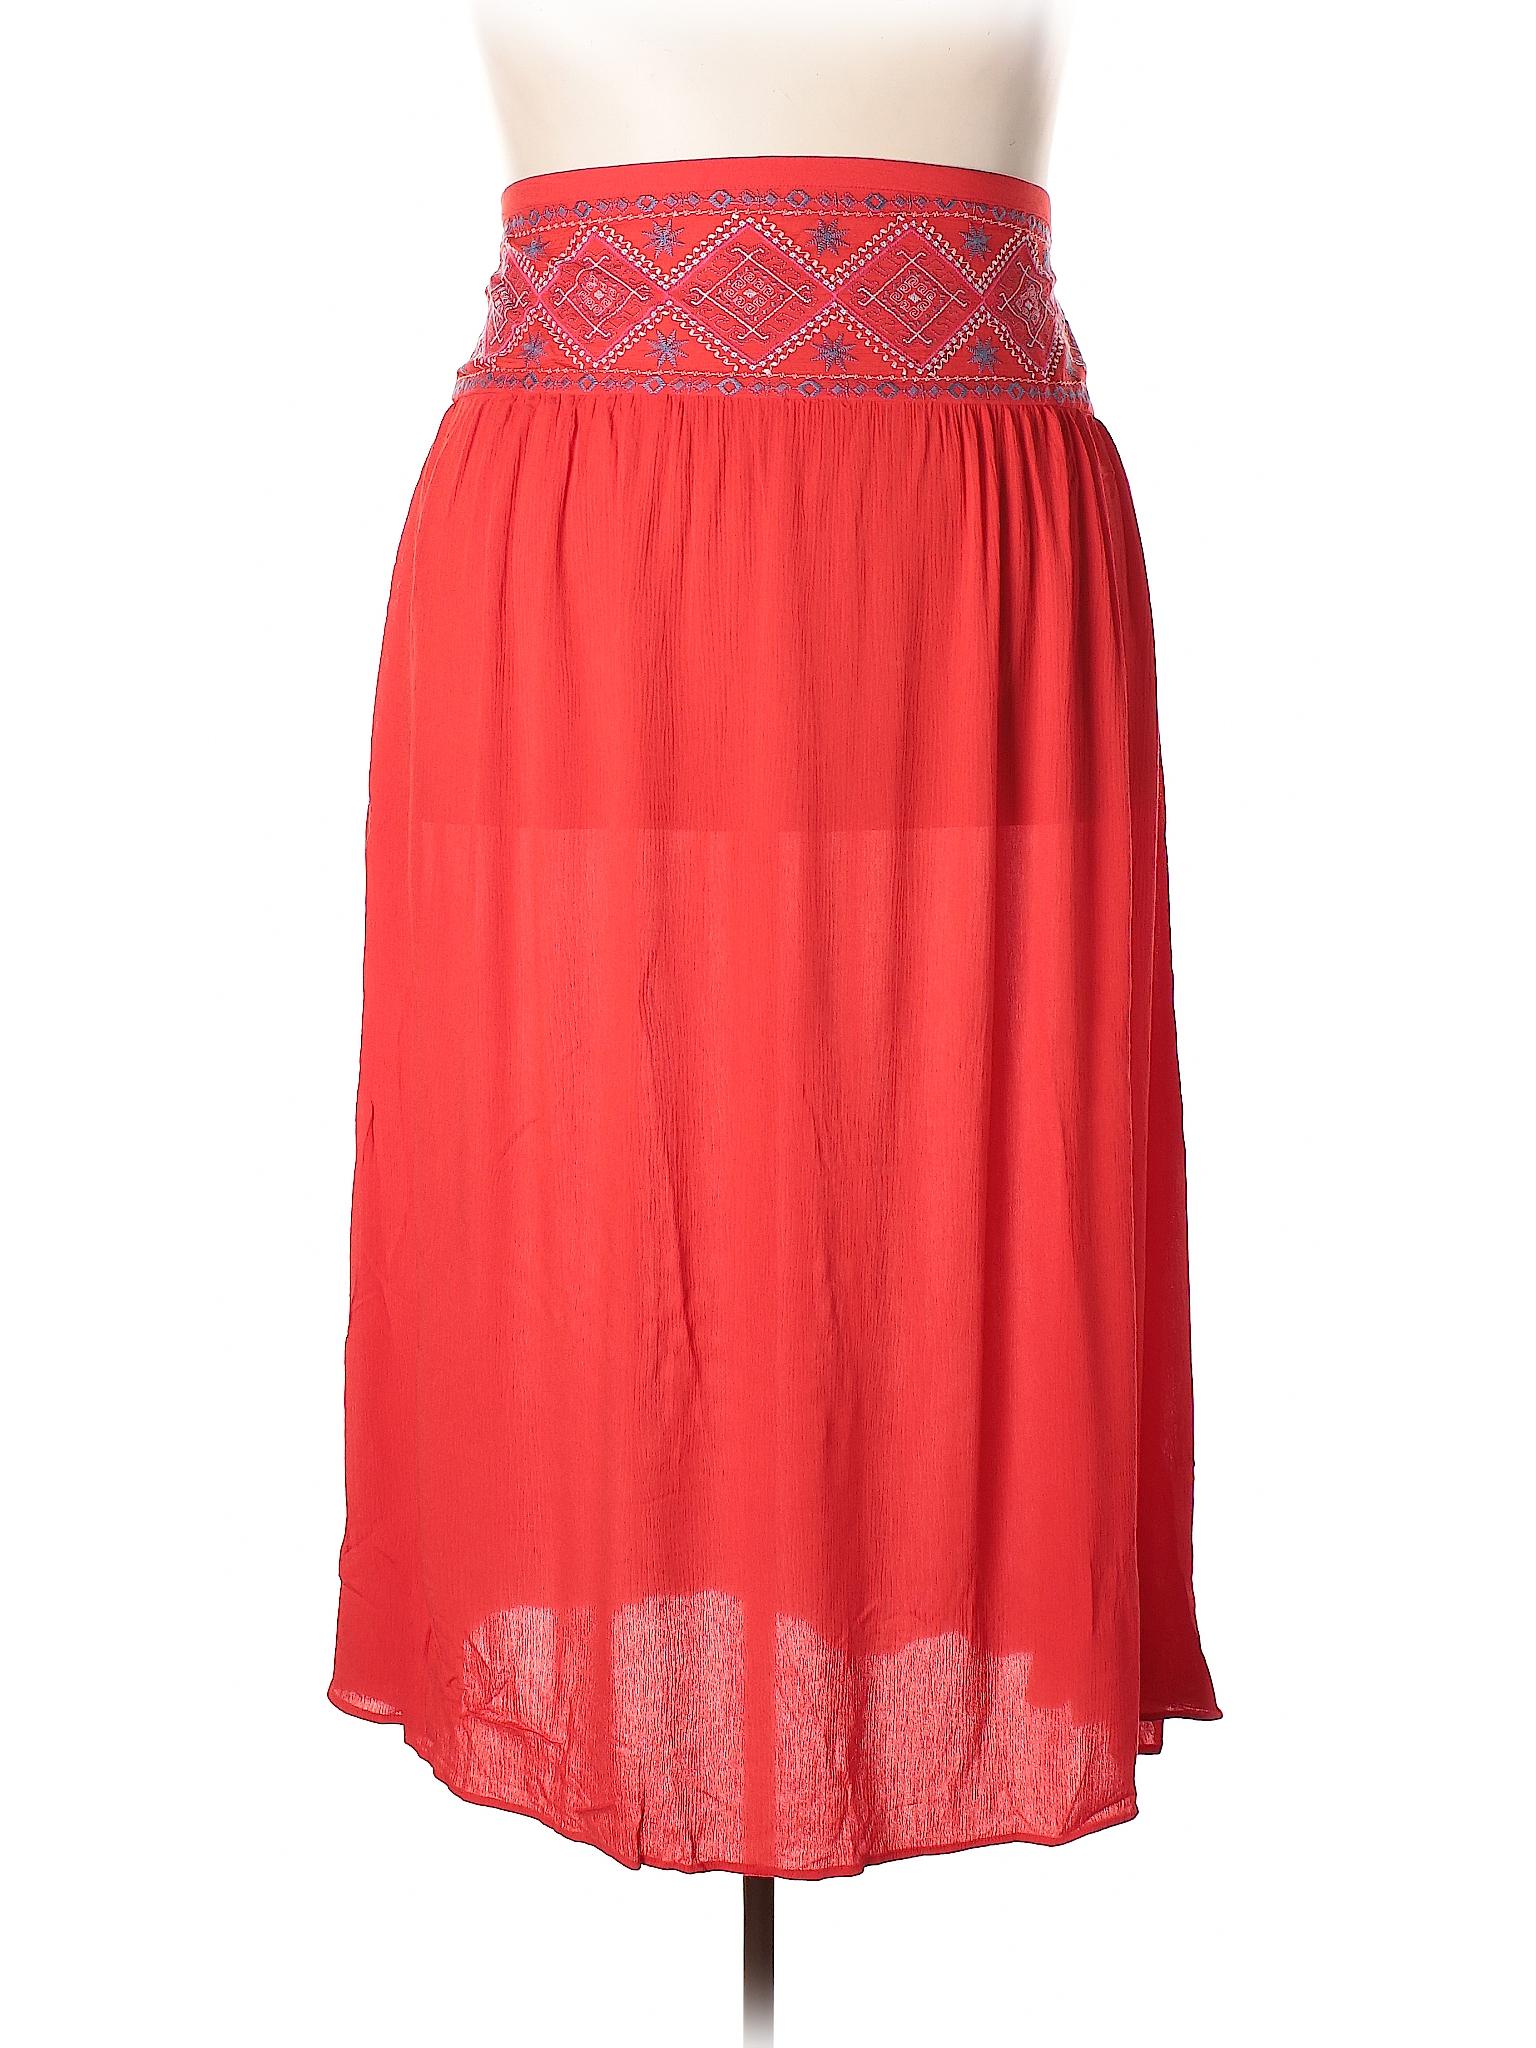 Boutique Skirt Casual Boutique Skirt Boutique Casual Casual Boutique Skirt 4zFwY